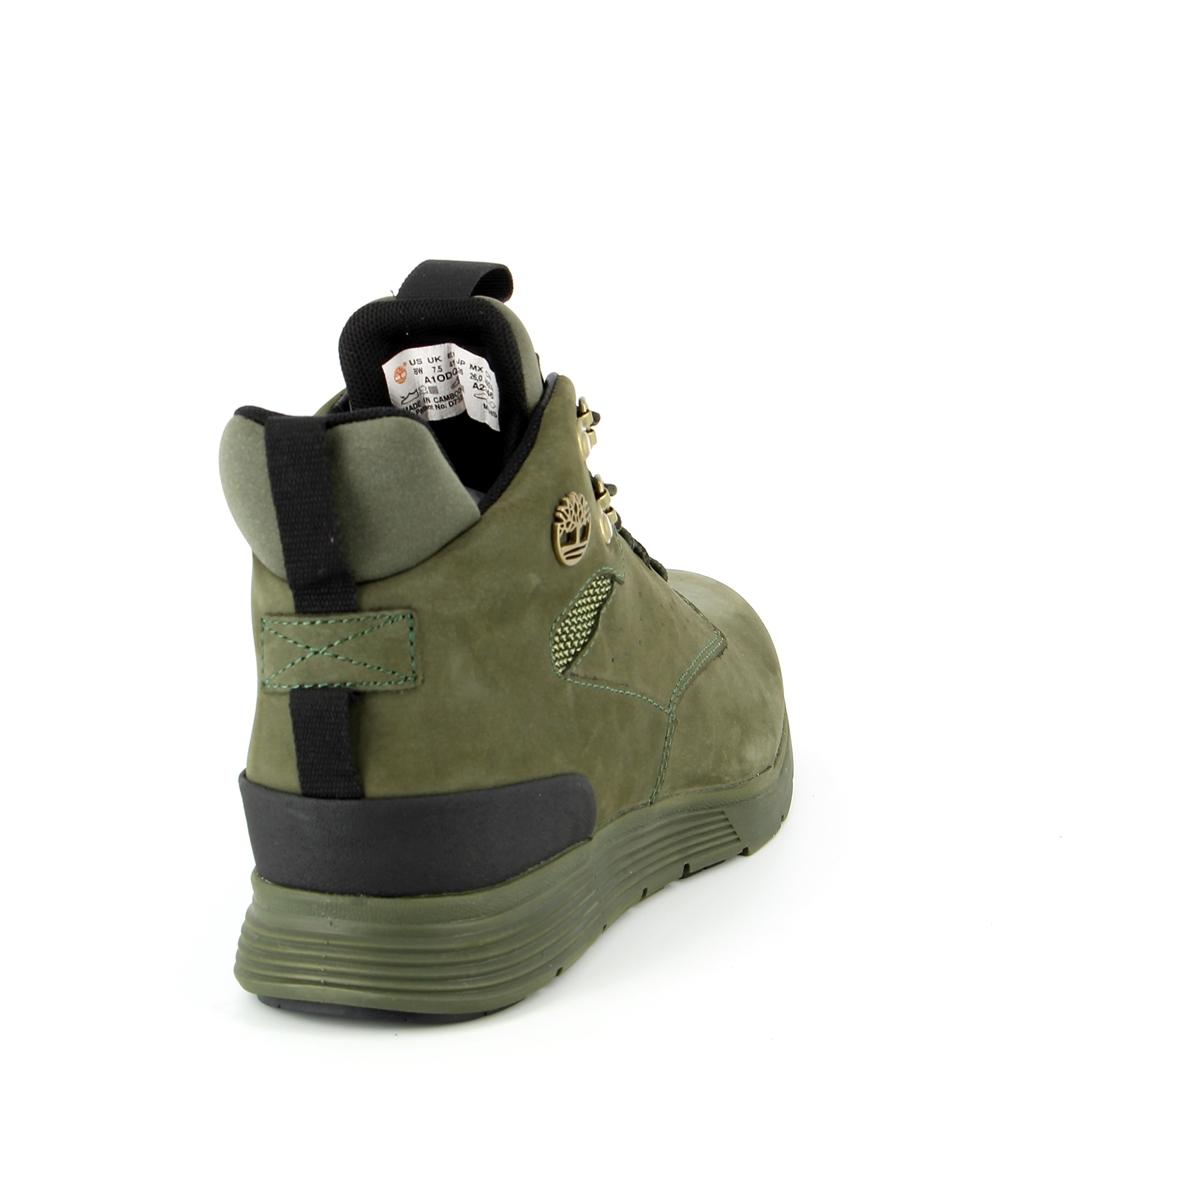 Timberland Bottinen kaki